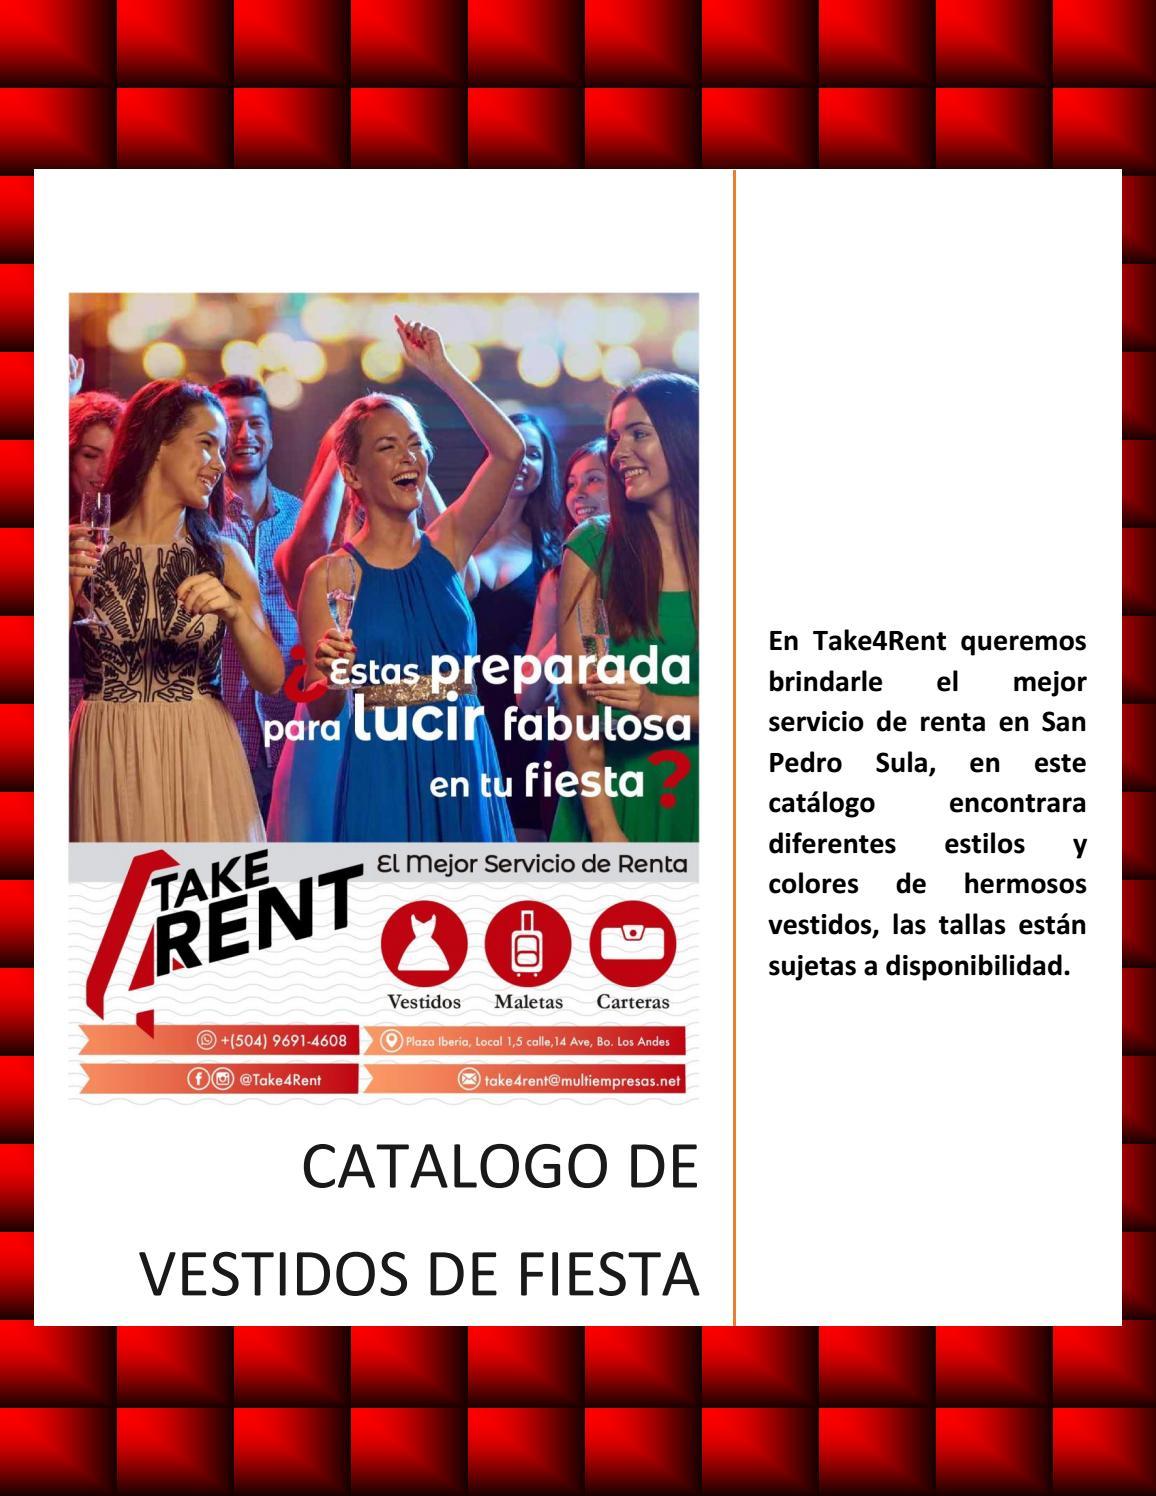 Catalogo De Vestidos De Fiesta By Take4rent Issuu